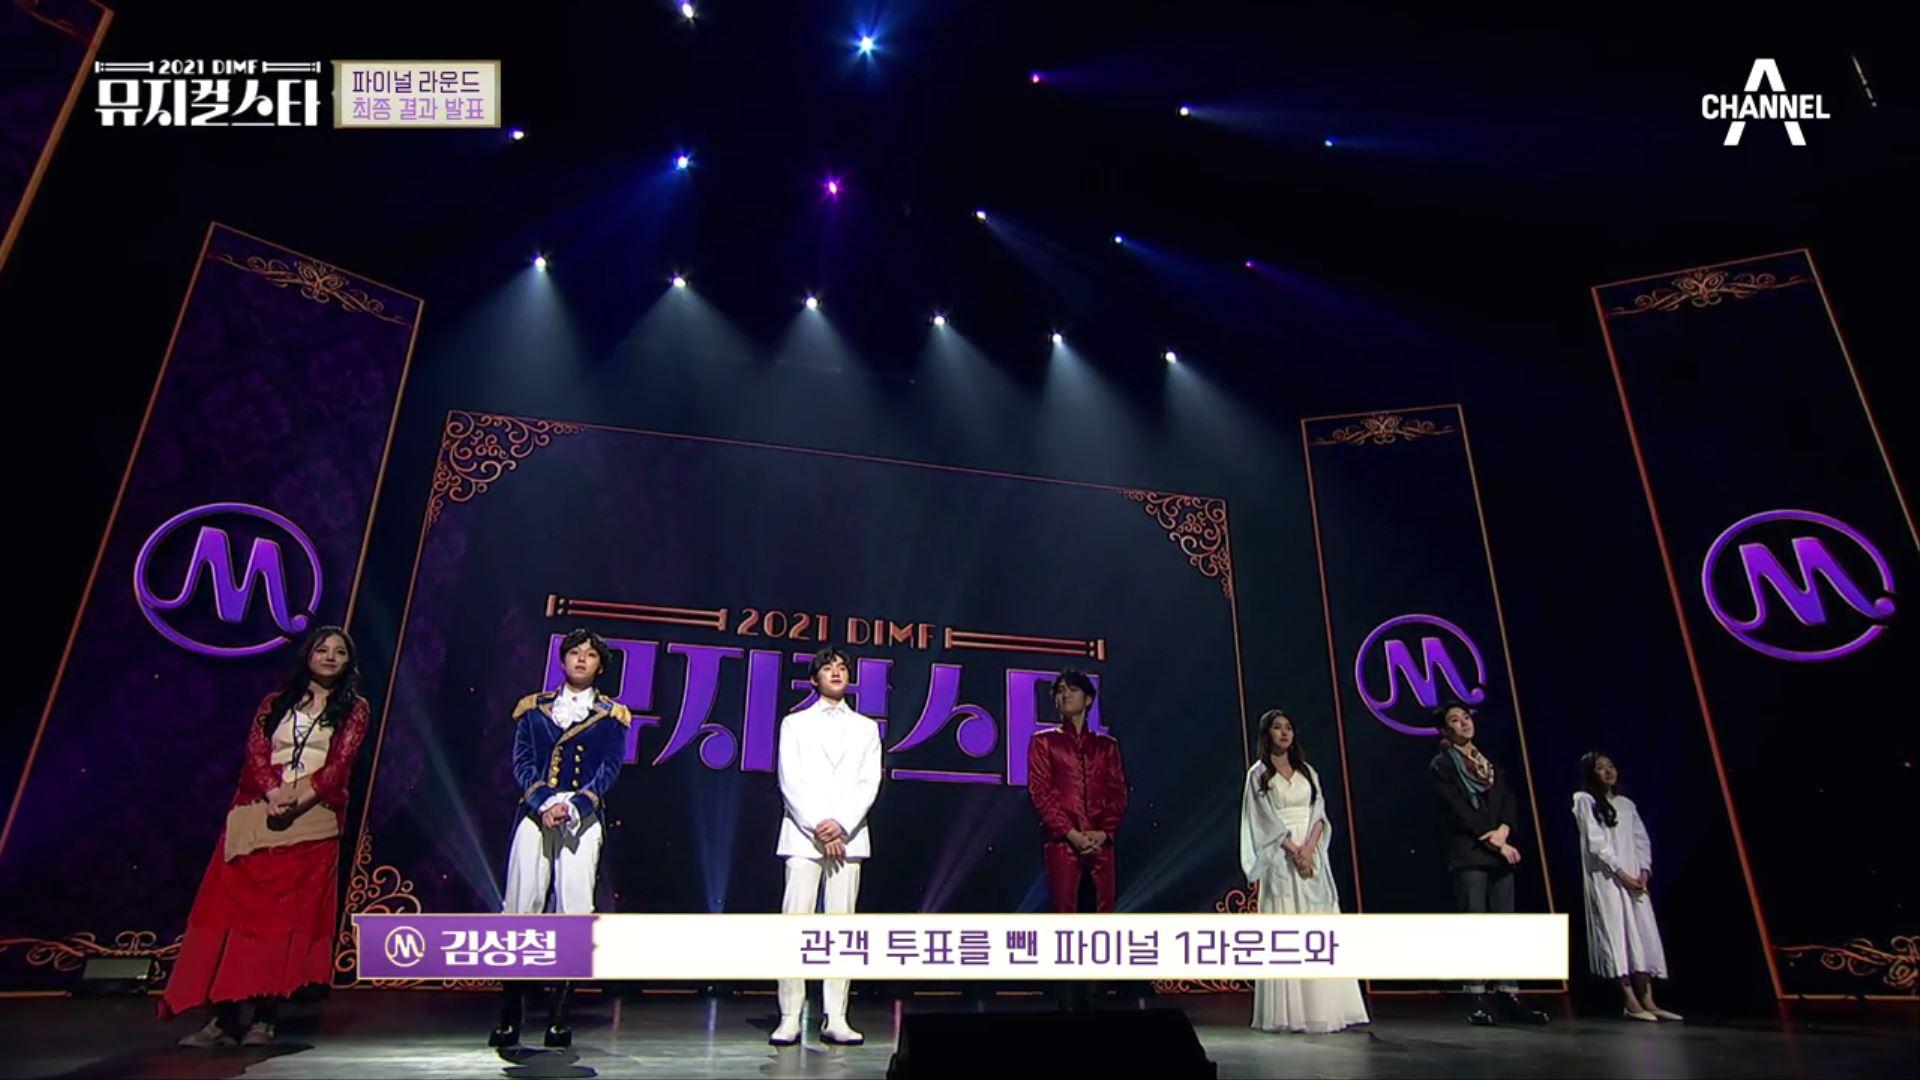 2021 DIMF 뮤지컬 스타 8회